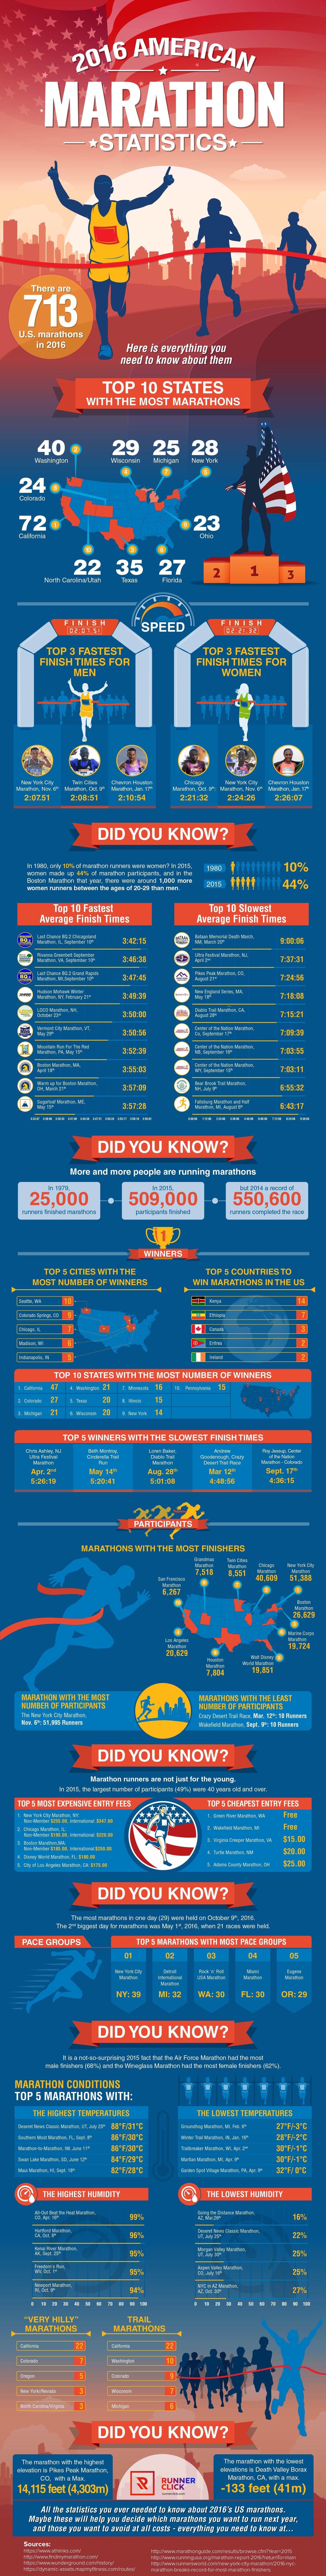 2016-united-states-marathon-statistics-infographic